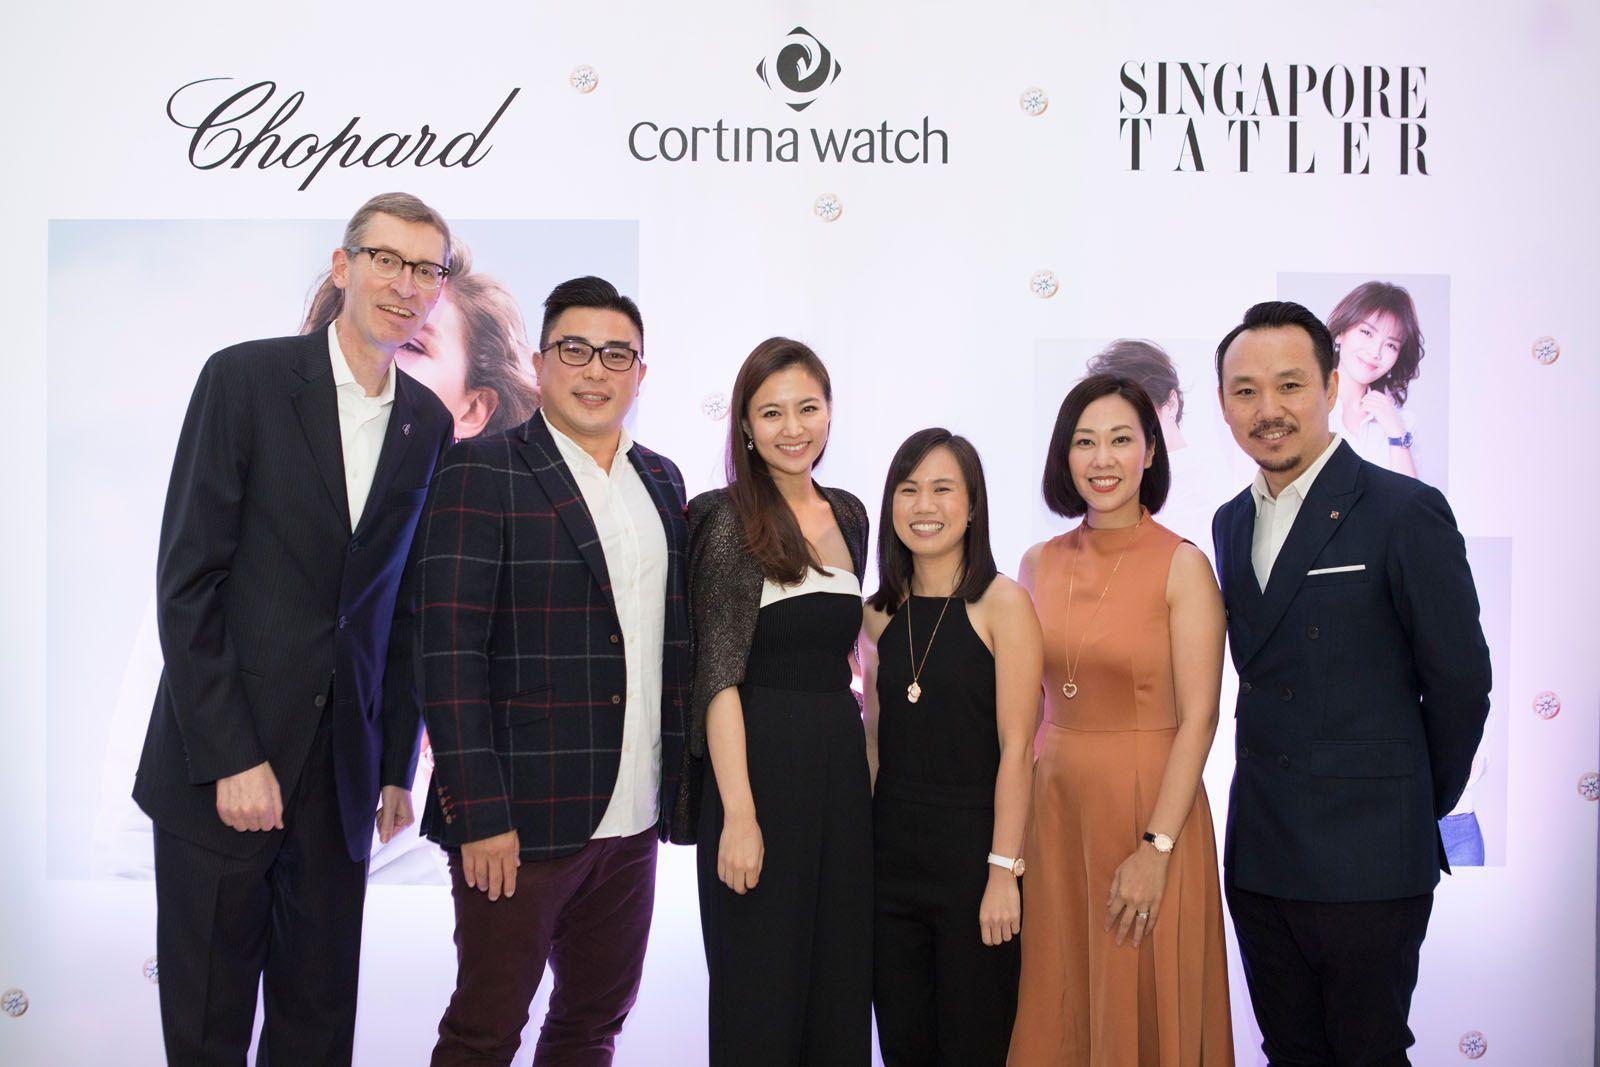 Stephan Ritzmann, Marcus Ang, Cheryl Wee, Debra Lam, Kissa Castañeda, Luke Ng